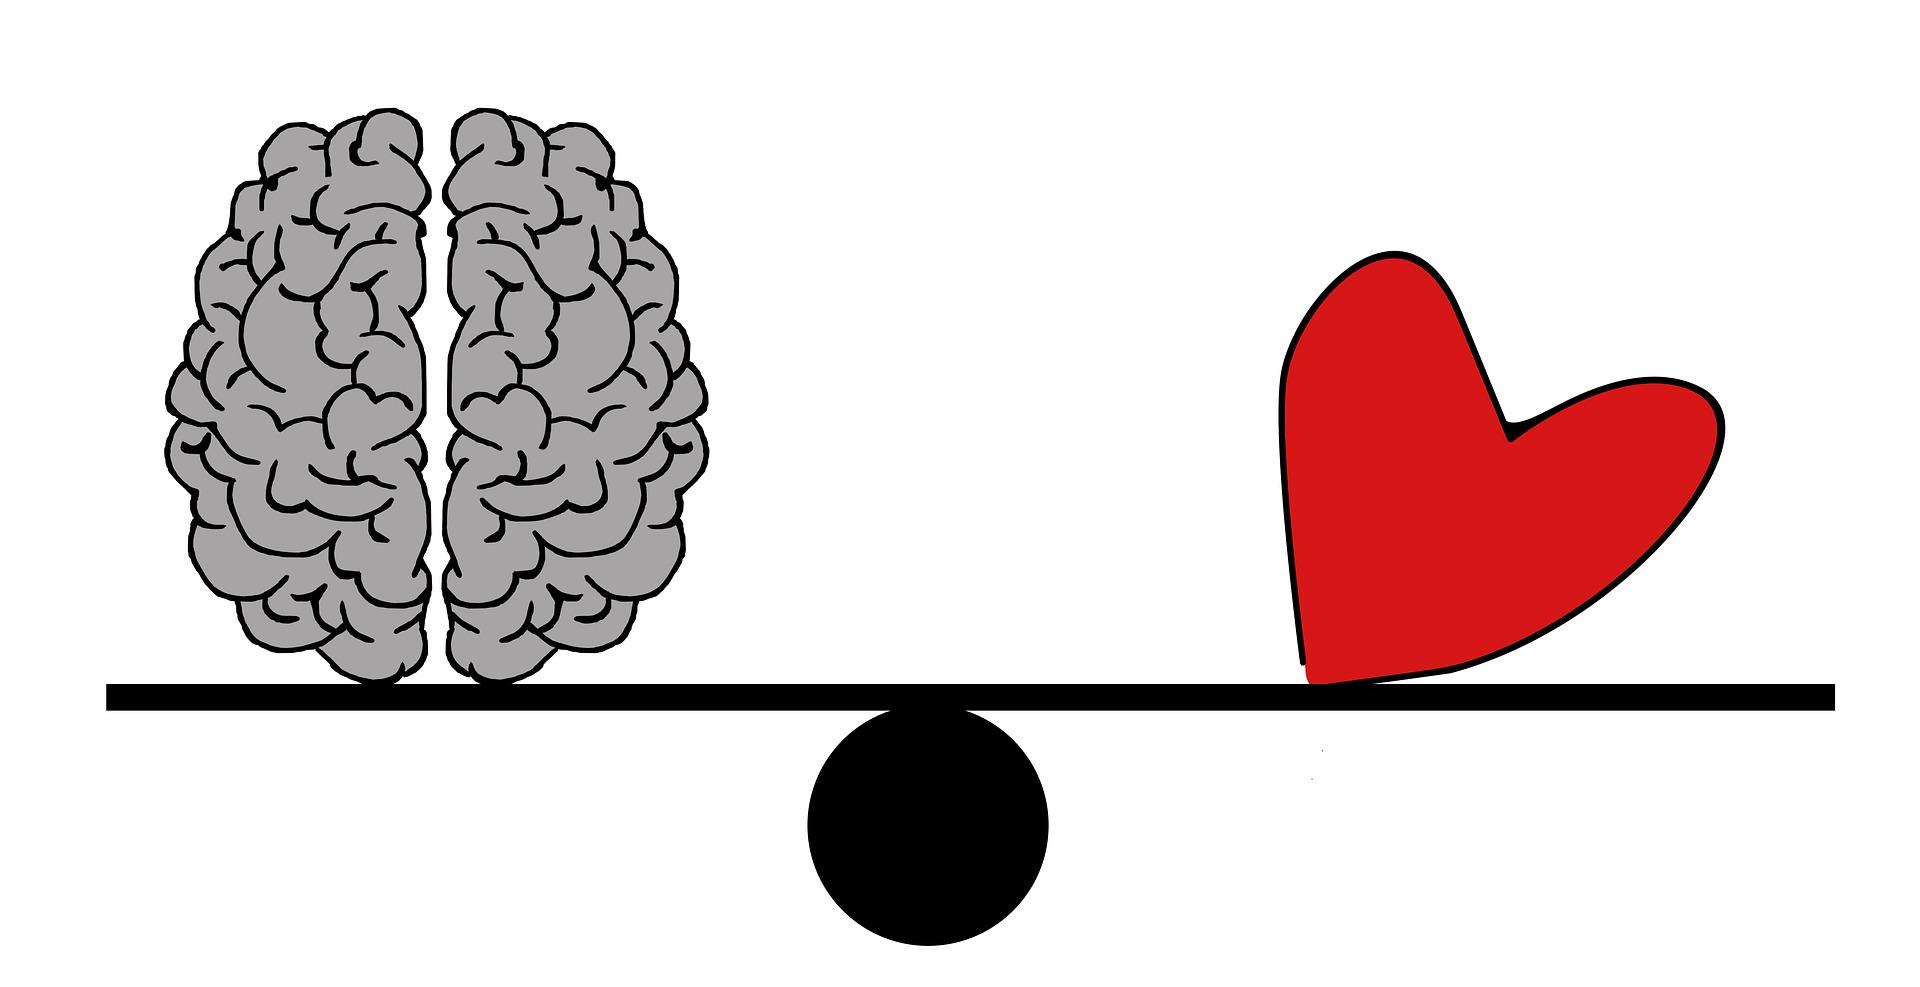 brain-2146156_1920